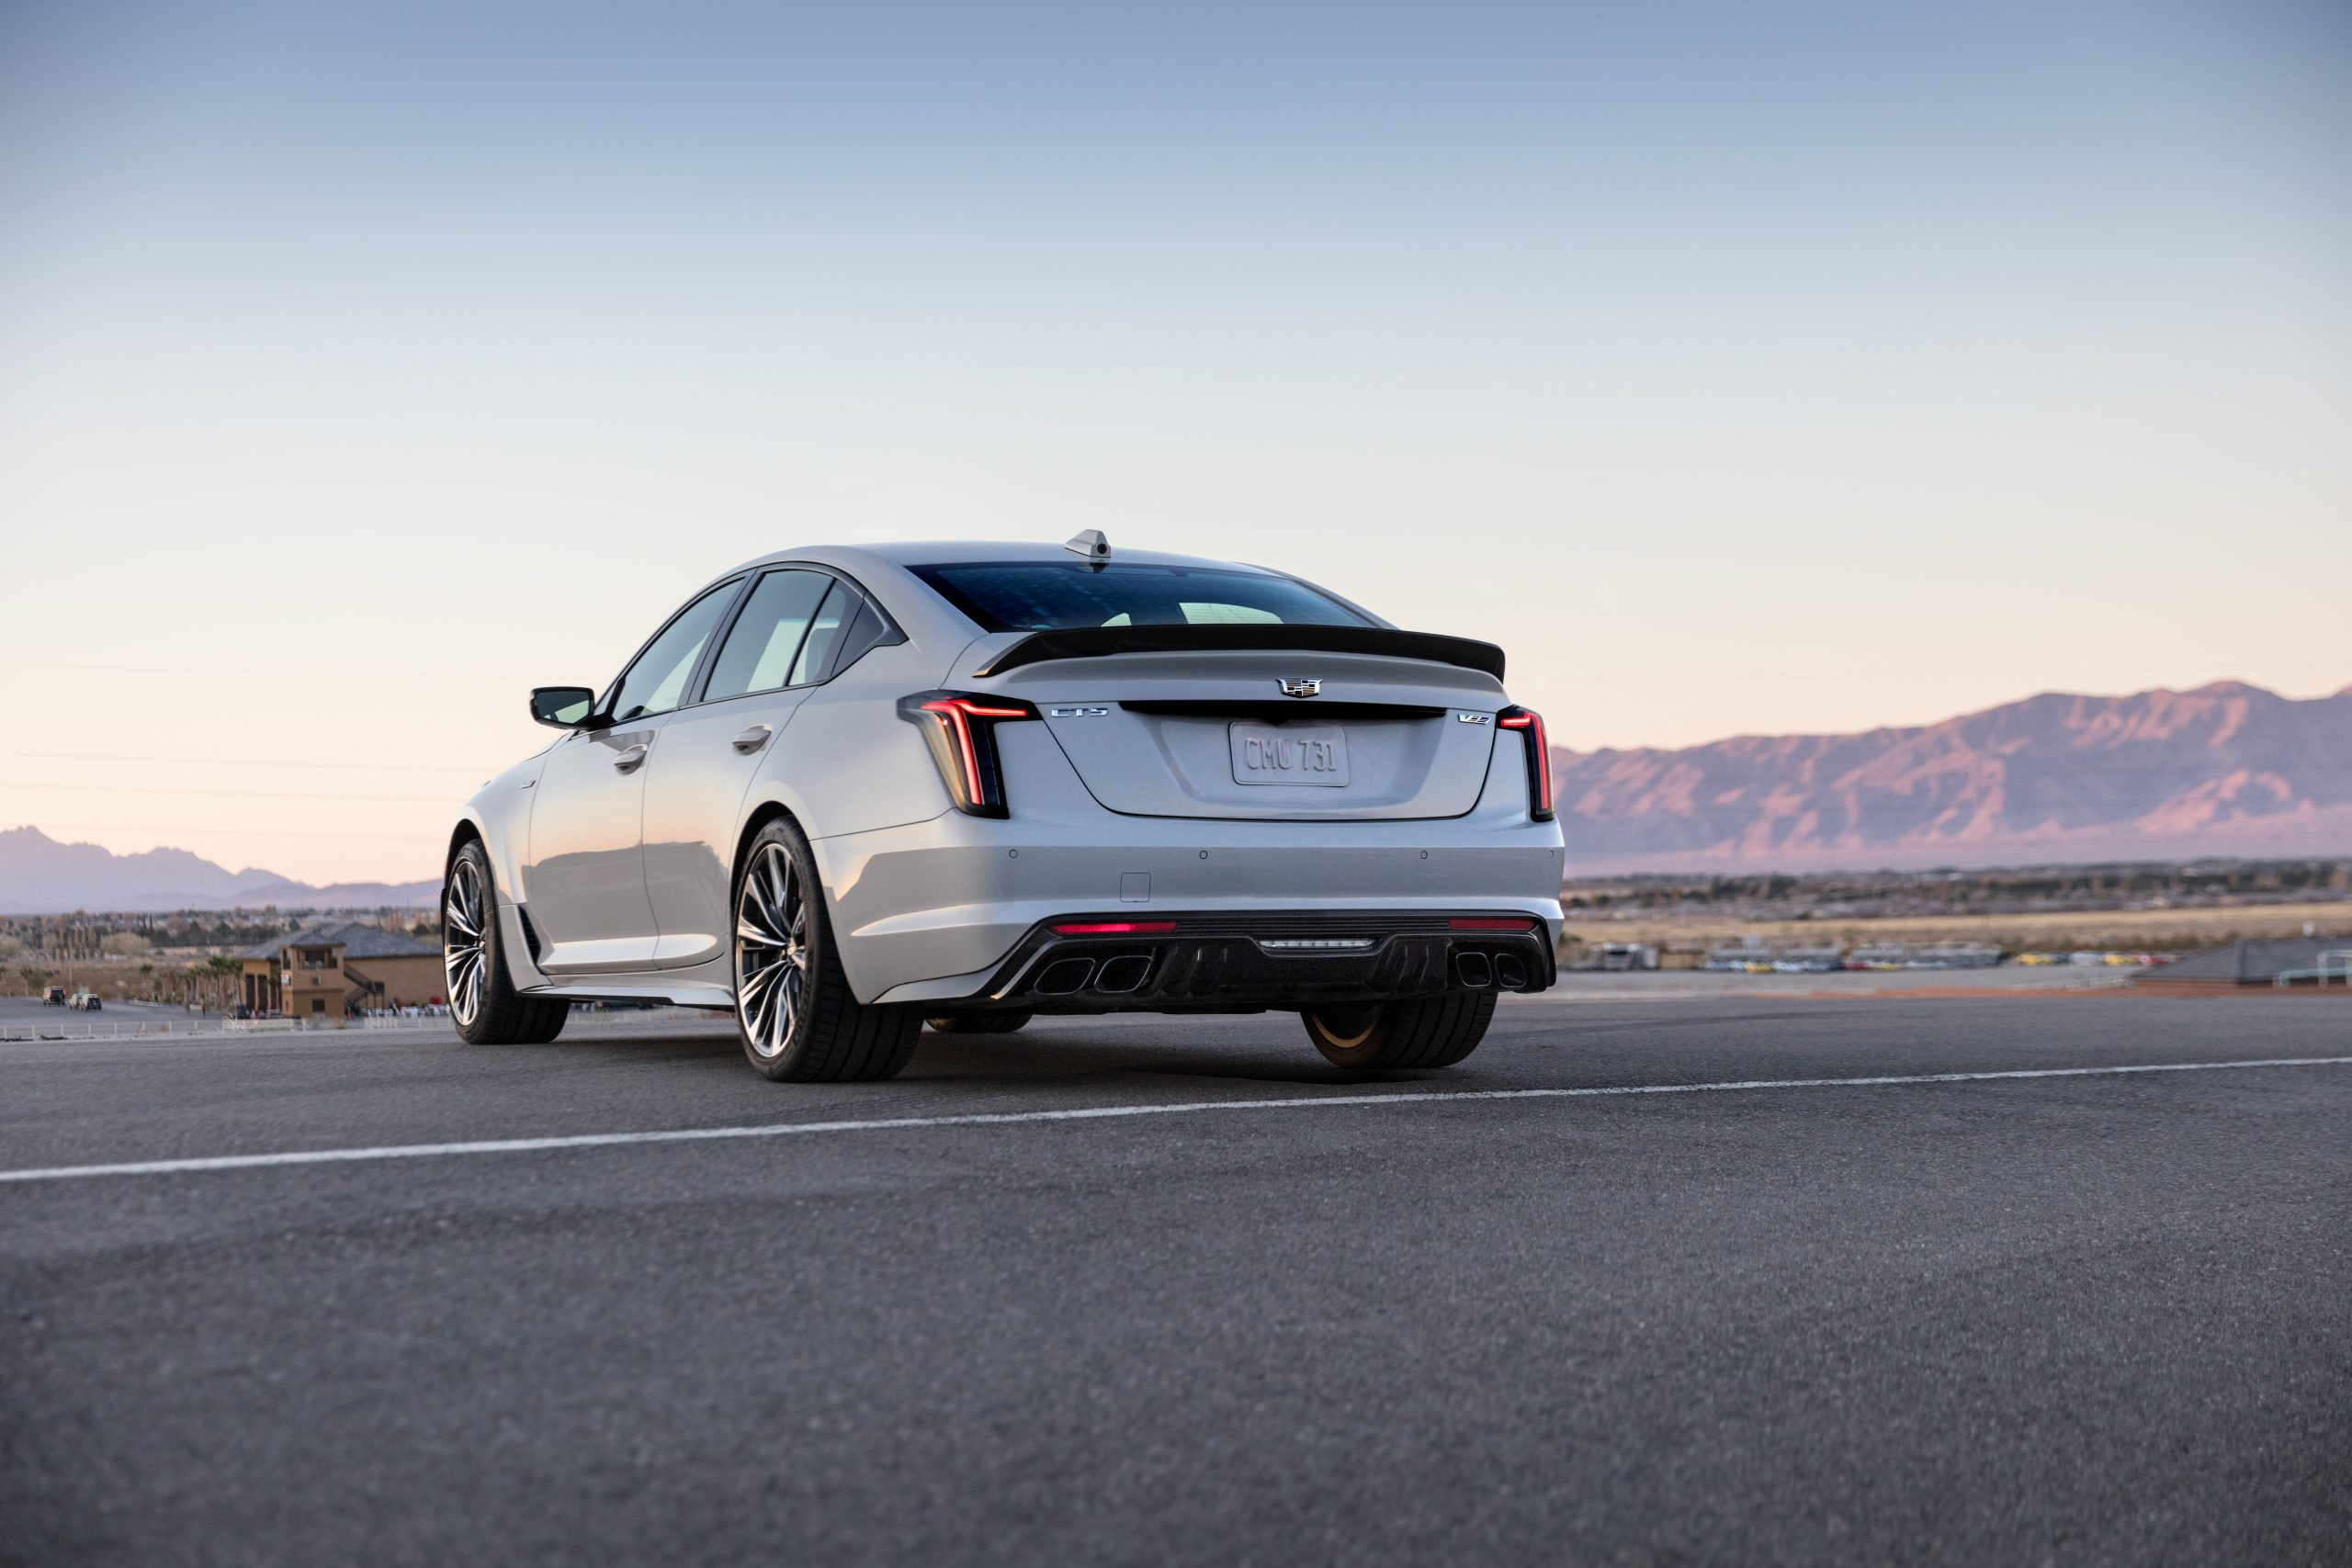 2022 Cadillac CT5-V Blackwing rear three quarter